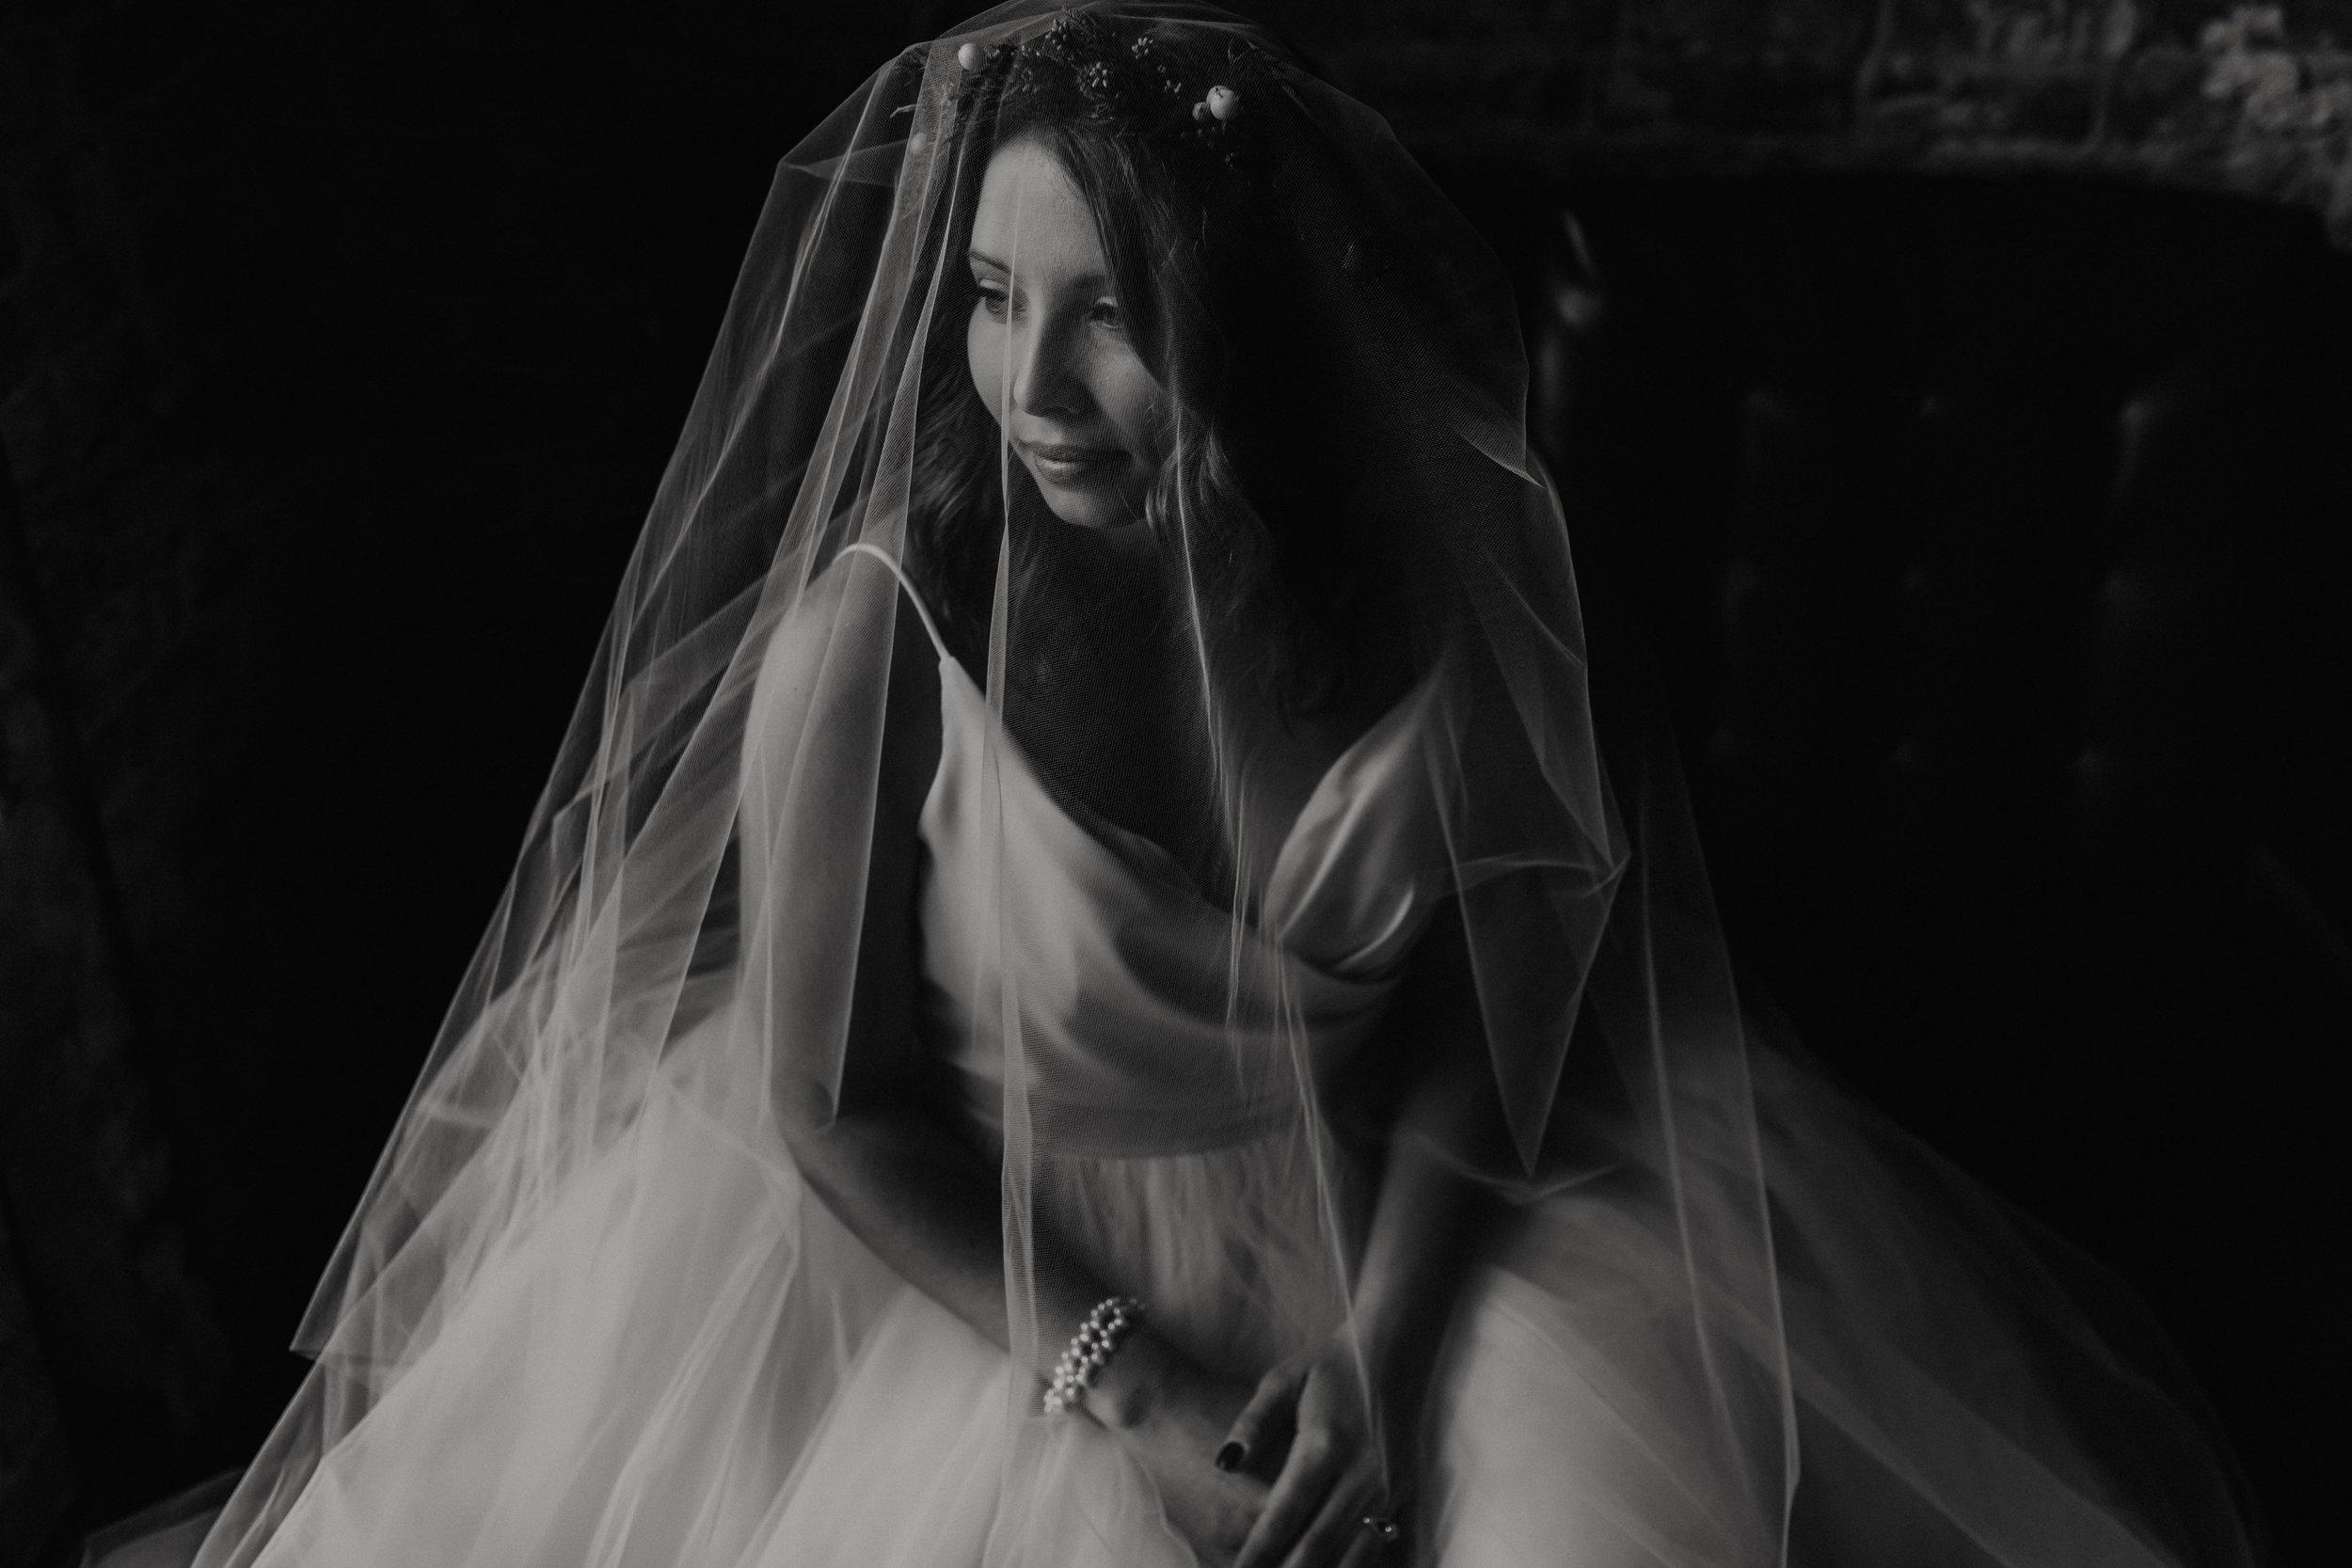 lucas_confectionery_wedding-34.jpg